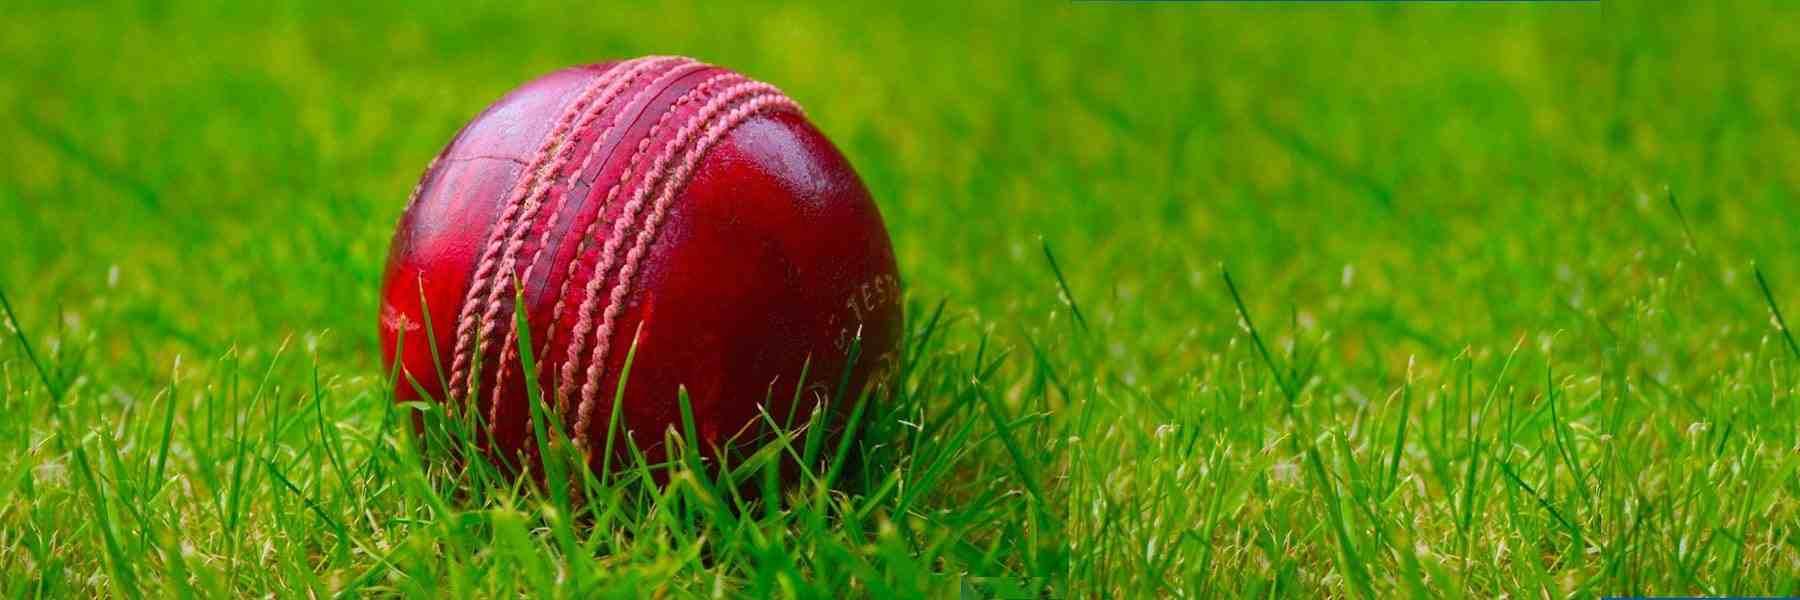 cricket managment software